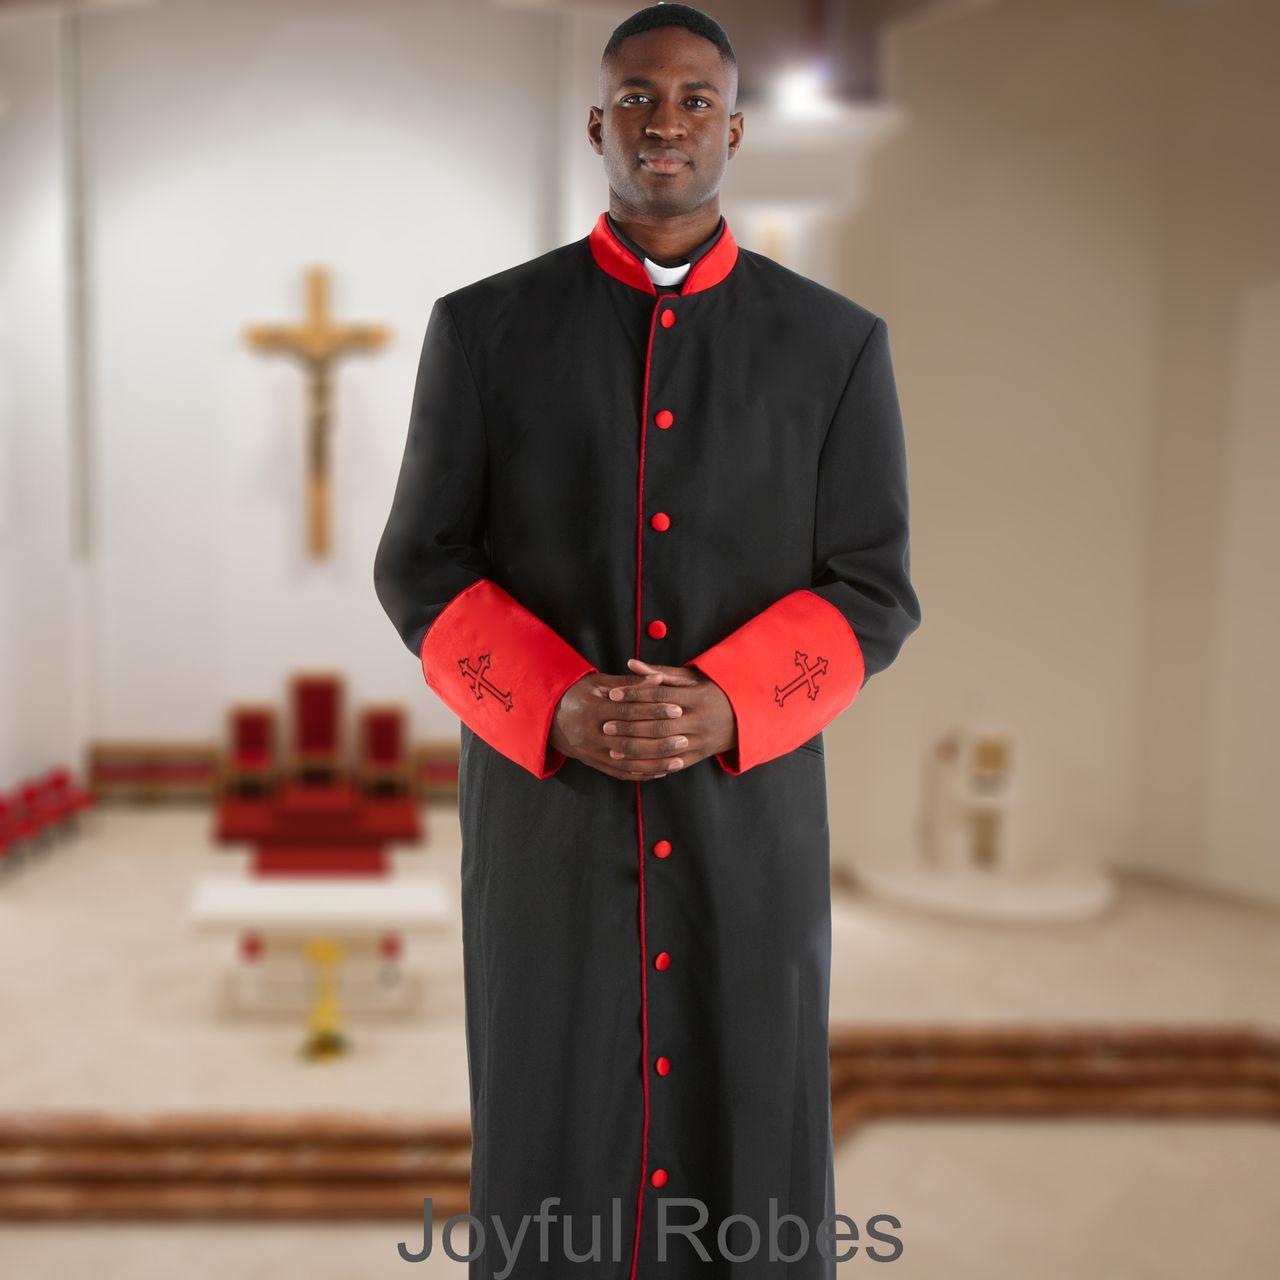 308 M. Men's Pastor/Clergy Robe - Black/Red Cuff